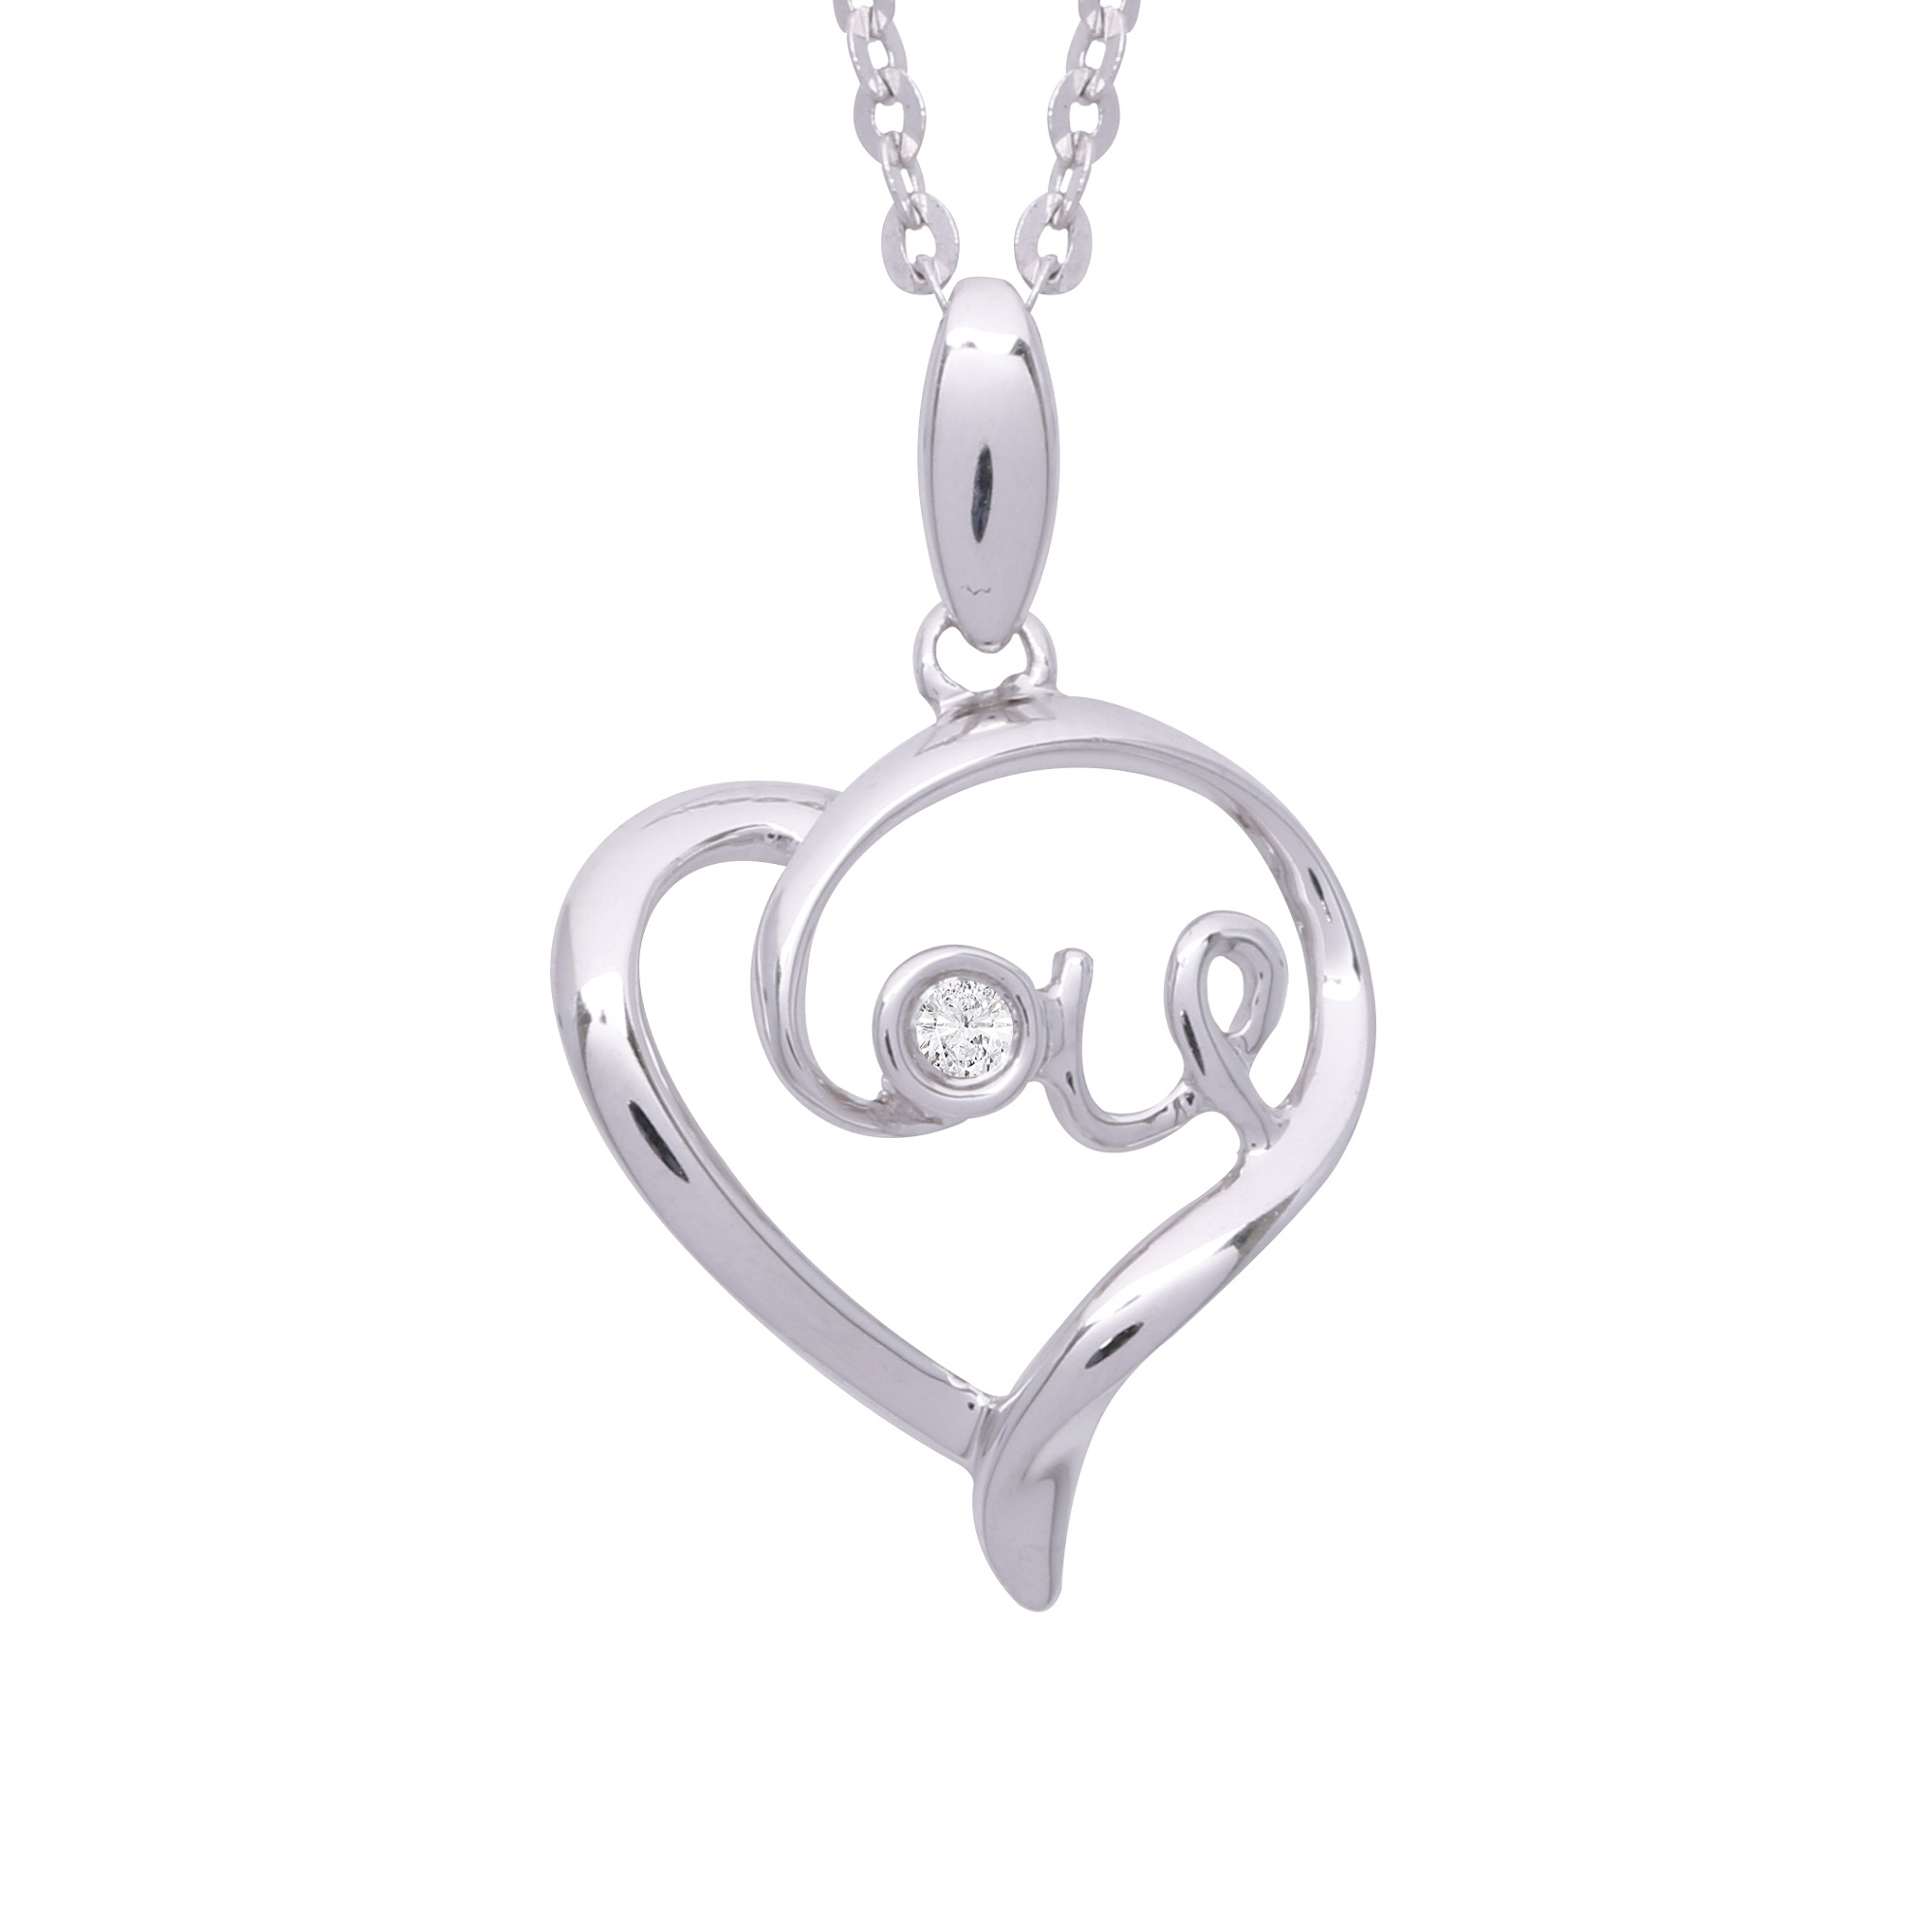 1995x1995 Lovey Heart 9k Diamond Pendant Dpb375 Lazo Diamond